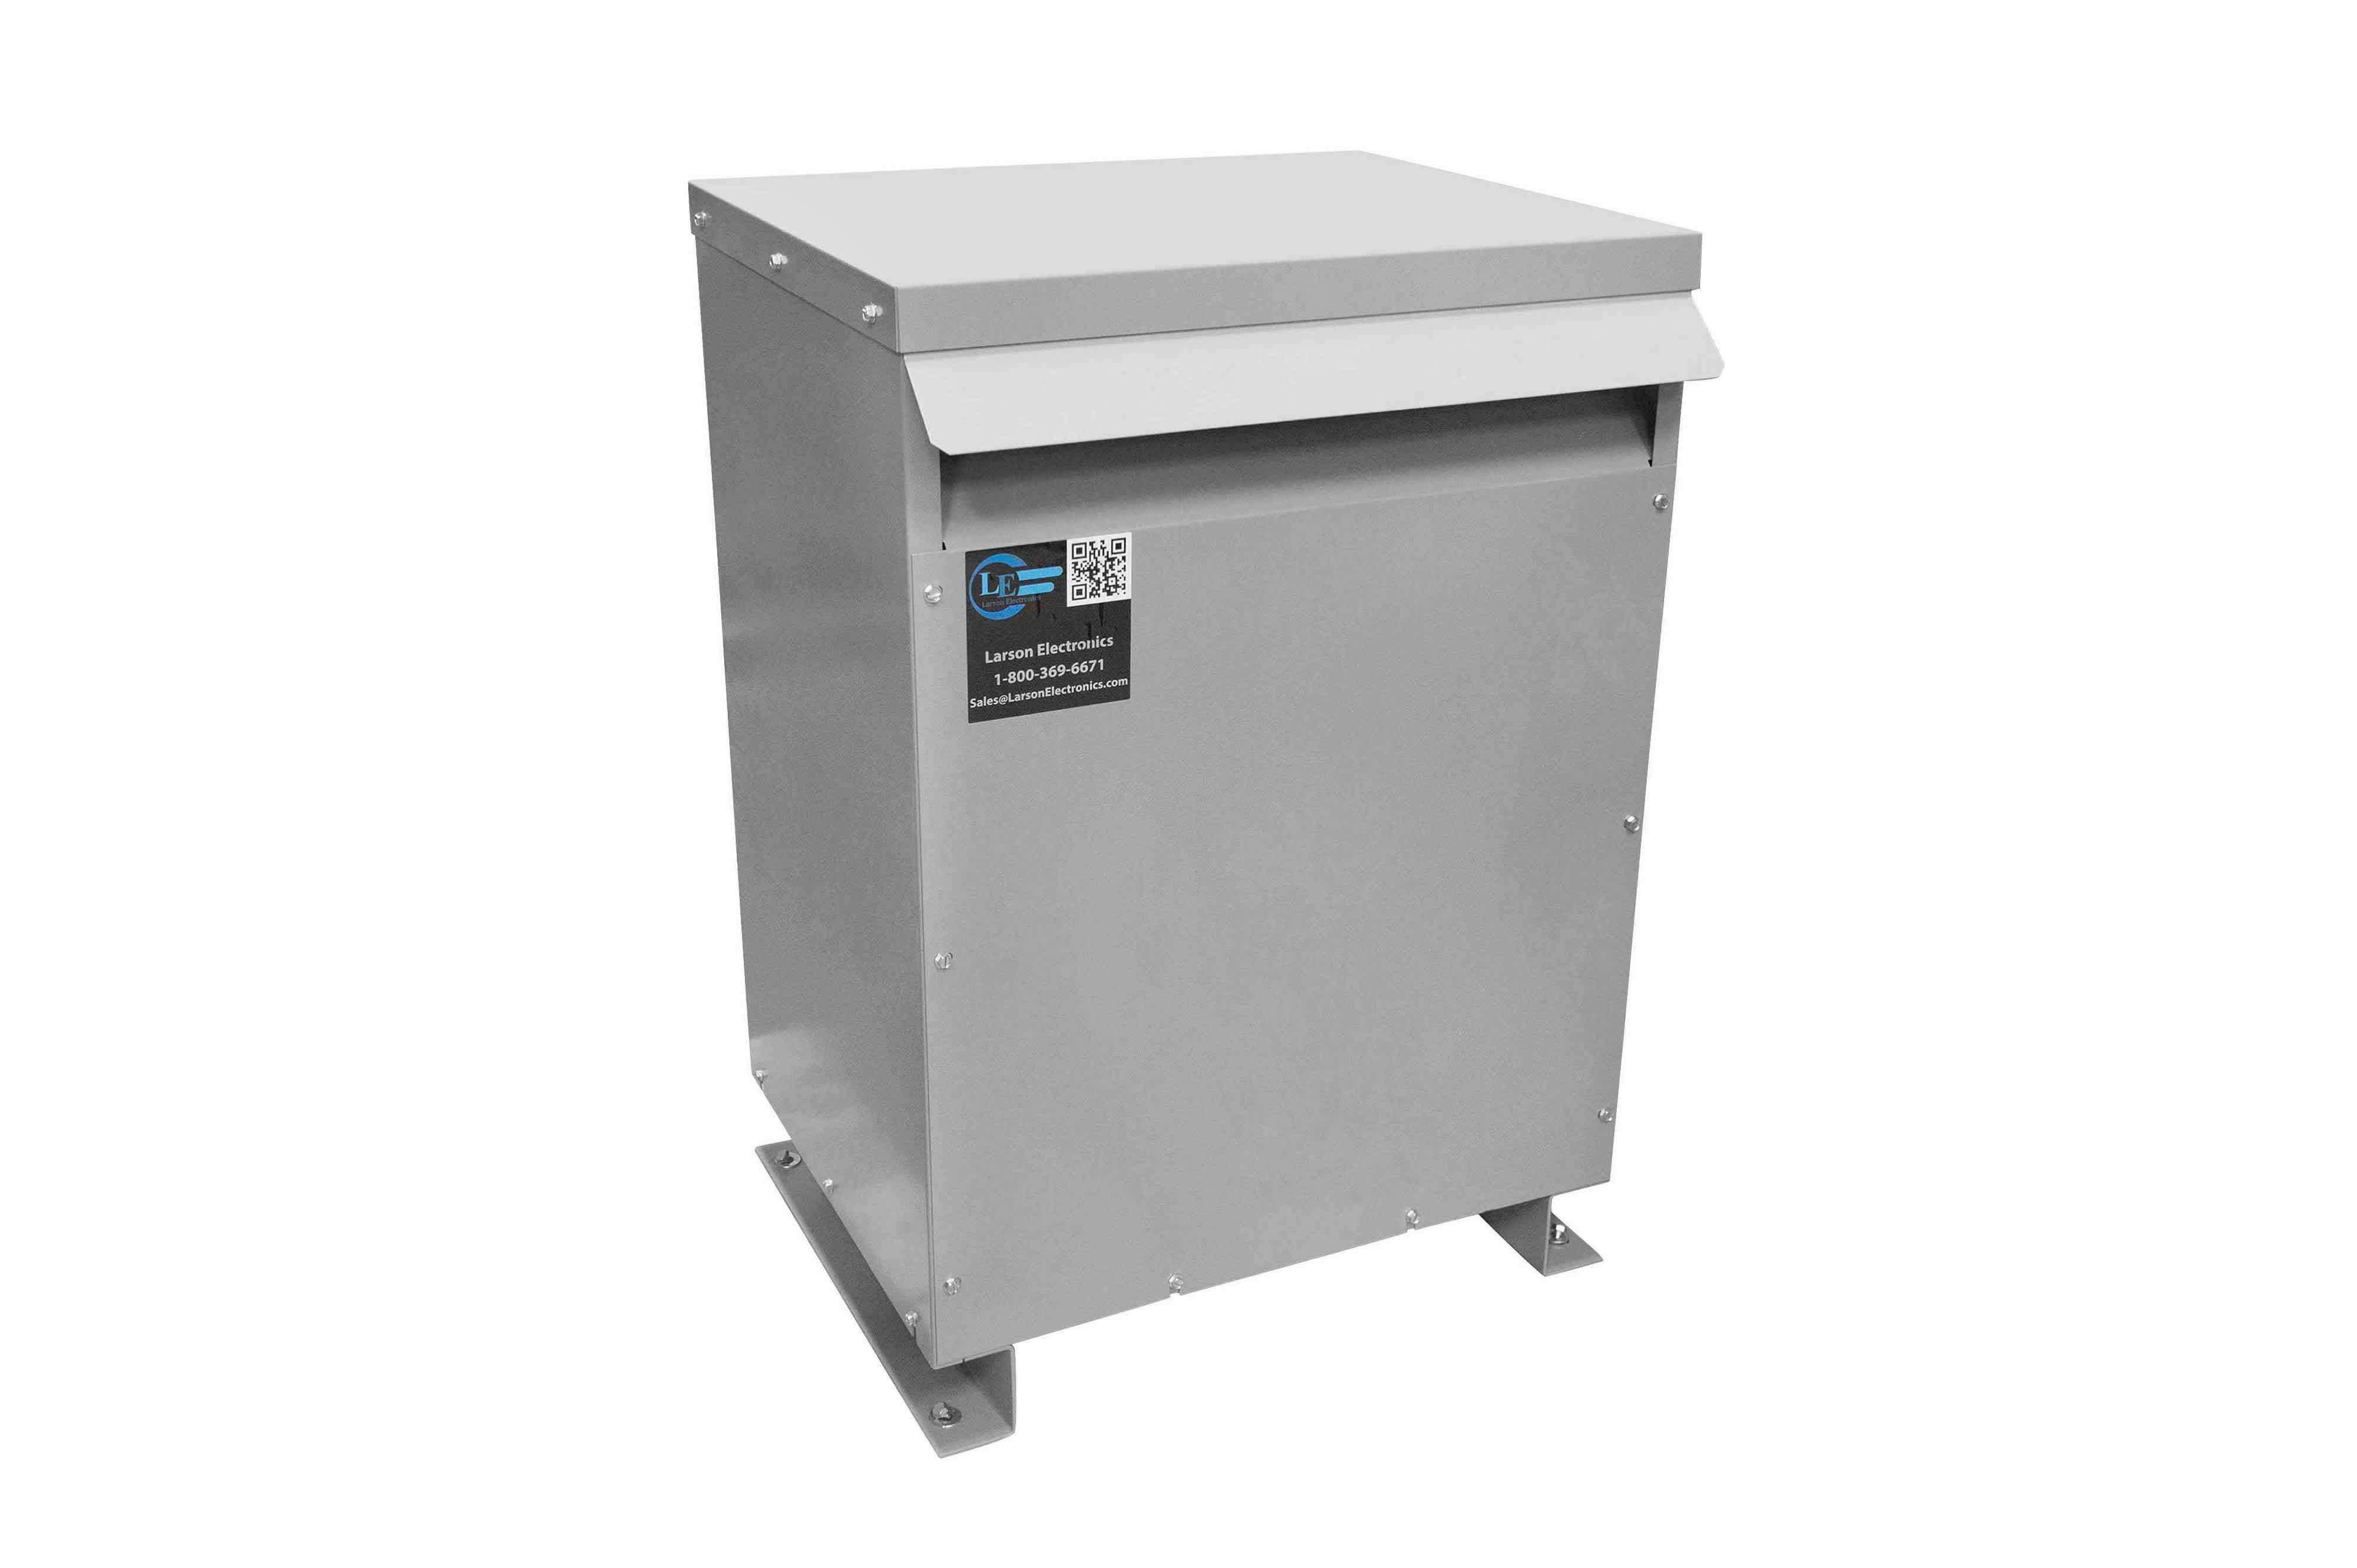 750 kVA 3PH DOE Transformer, 380V Delta Primary, 600Y/347 Wye-N Secondary, N3R, Ventilated, 60 Hz